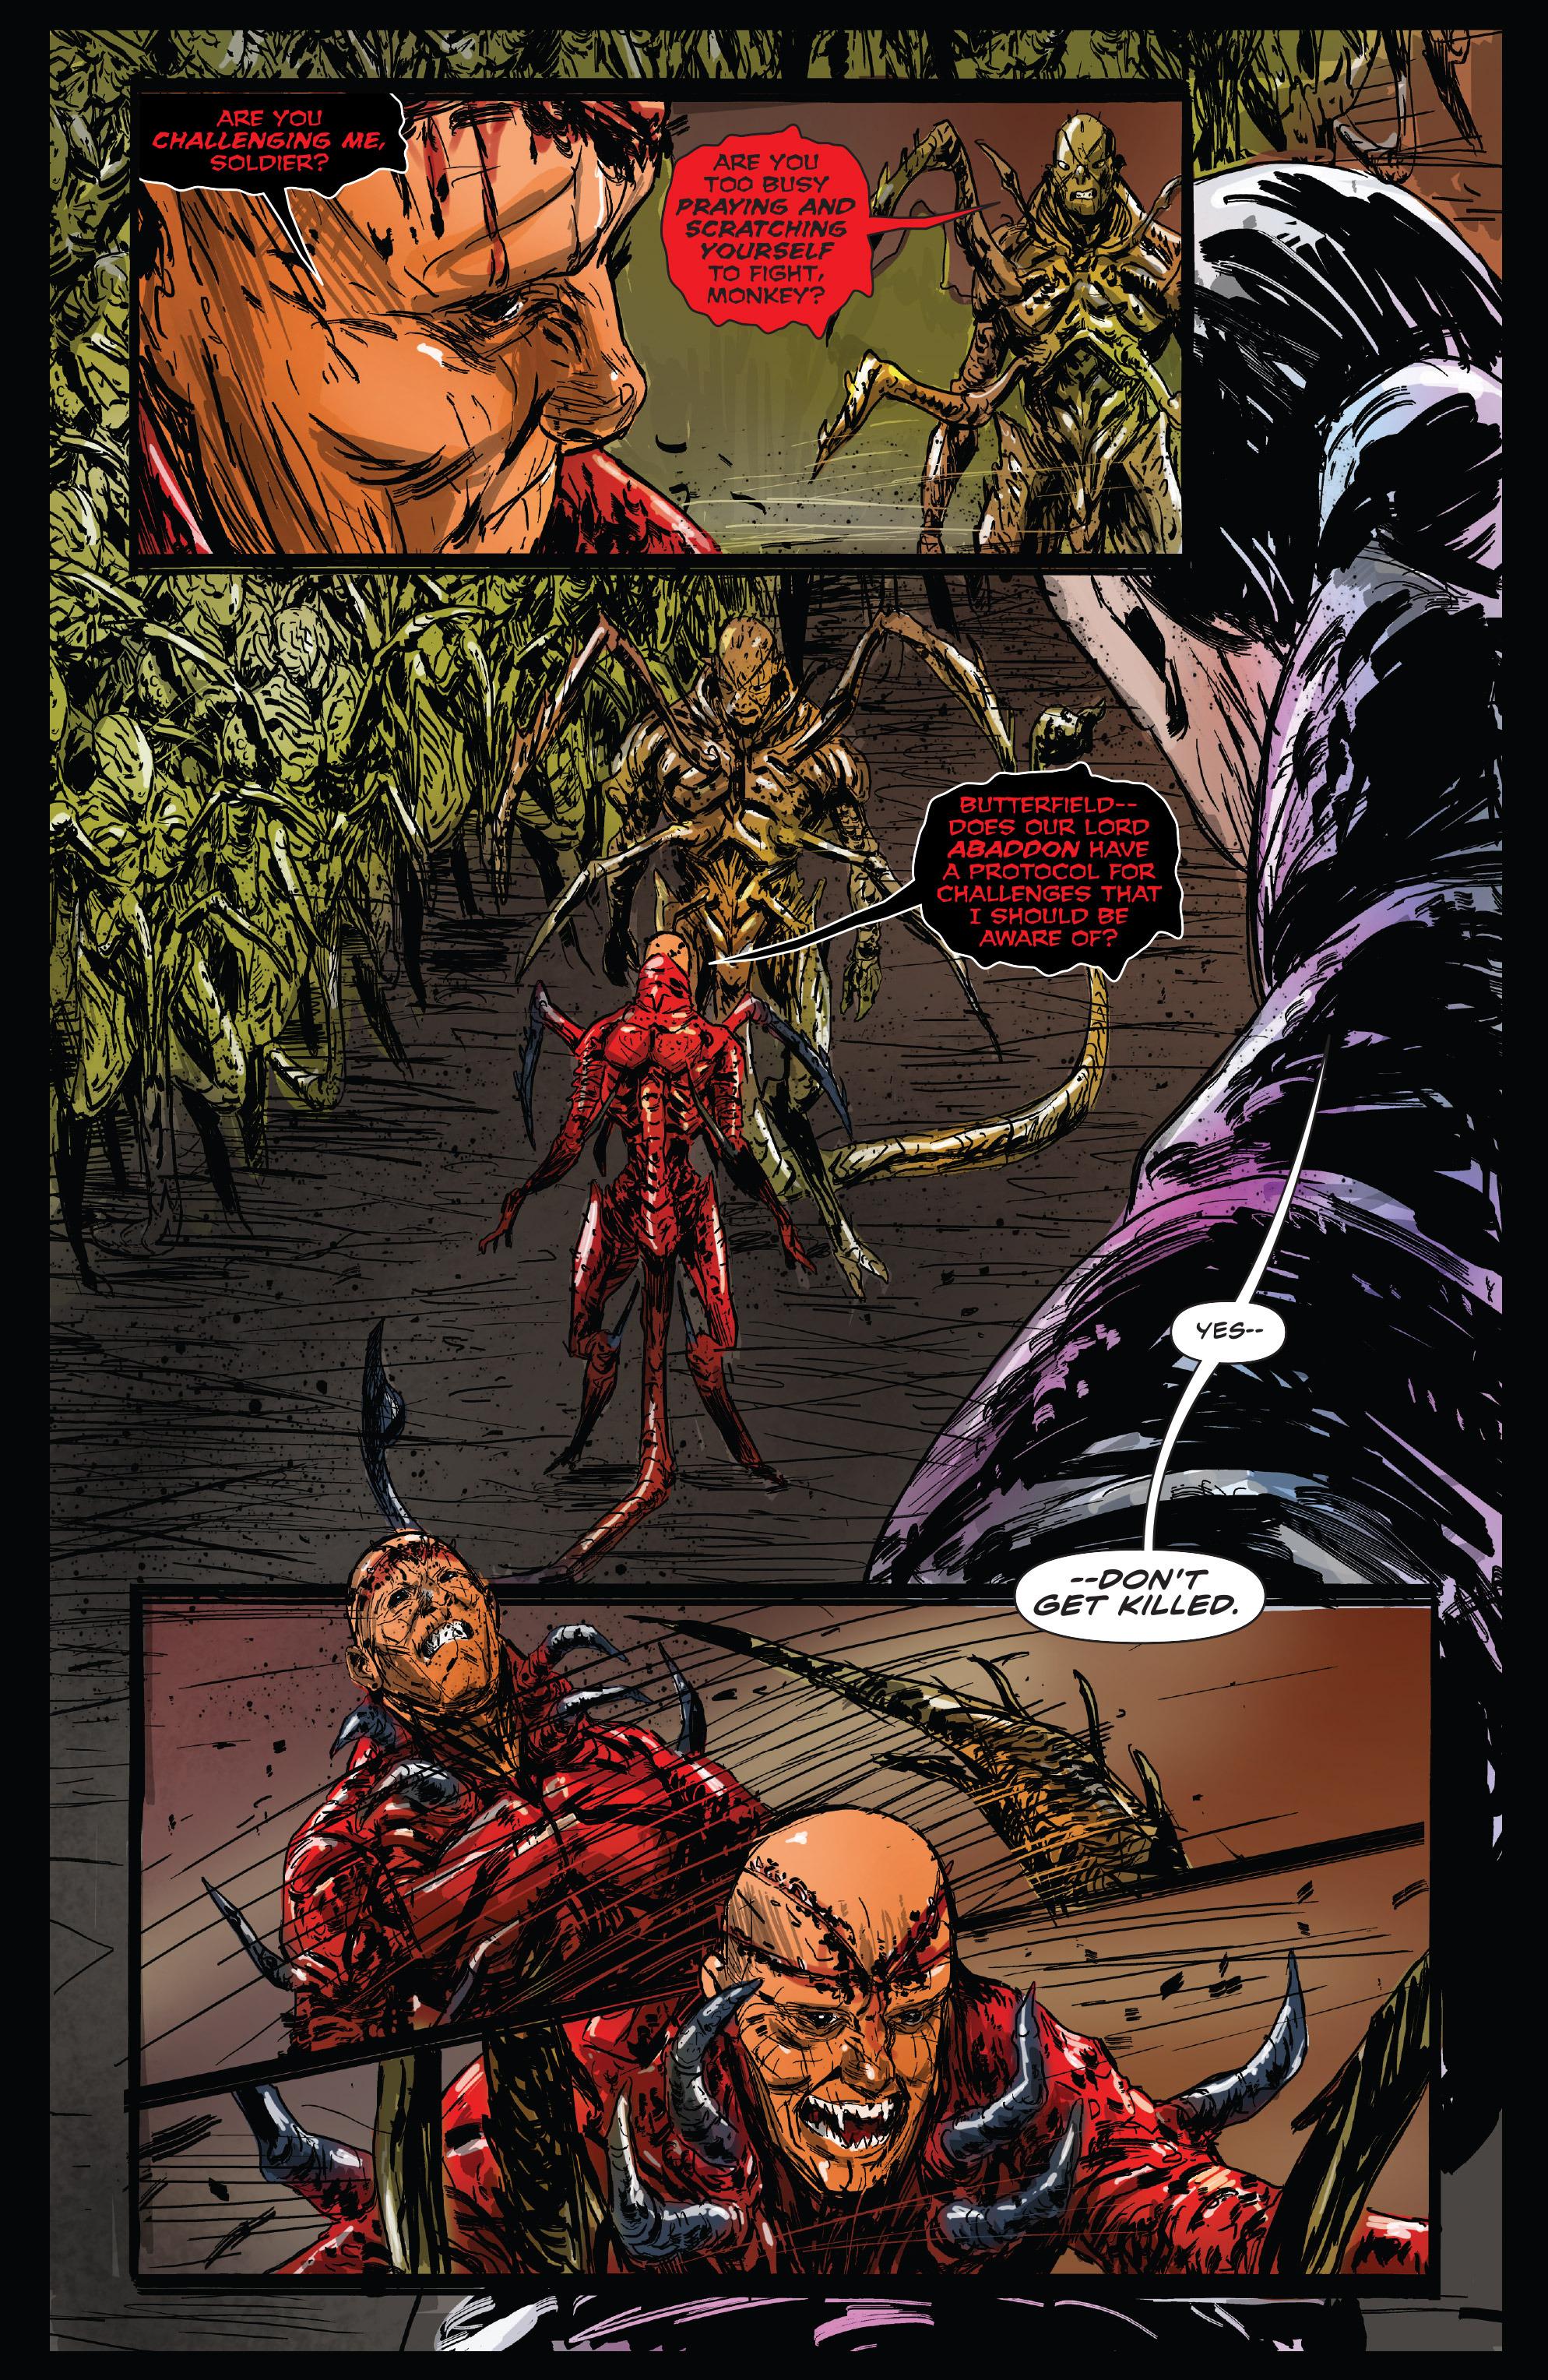 Read online Clive Barker's Hellraiser: The Dark Watch comic -  Issue # TPB 3 - 9